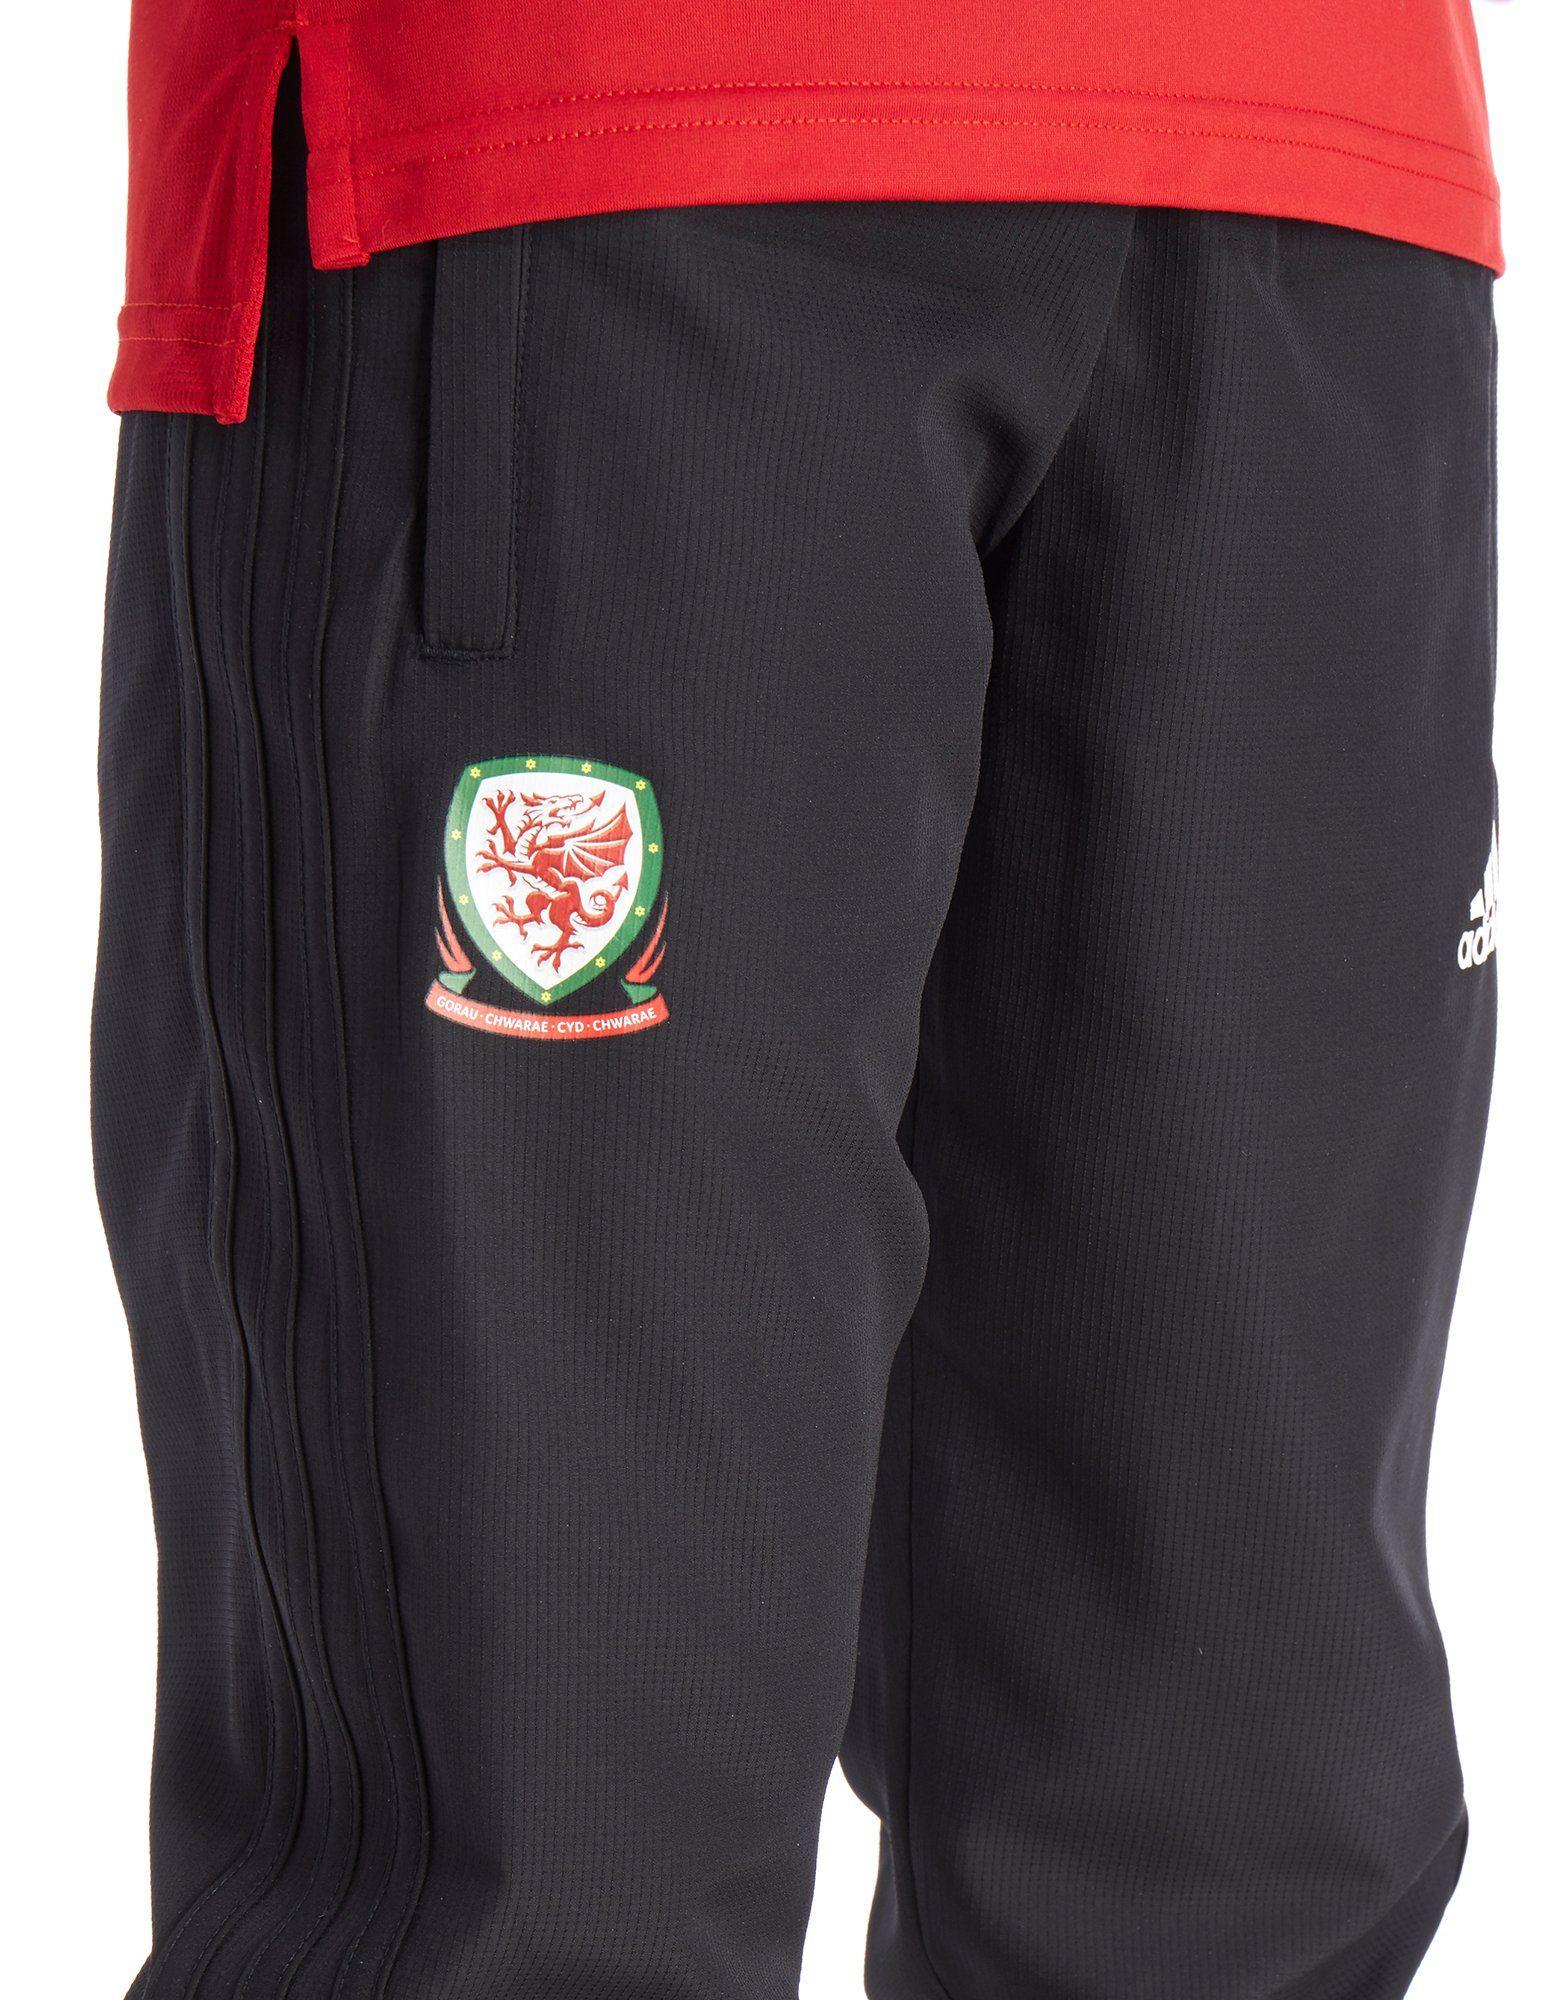 adidas FA Galles 2018 Pantaloni Junior